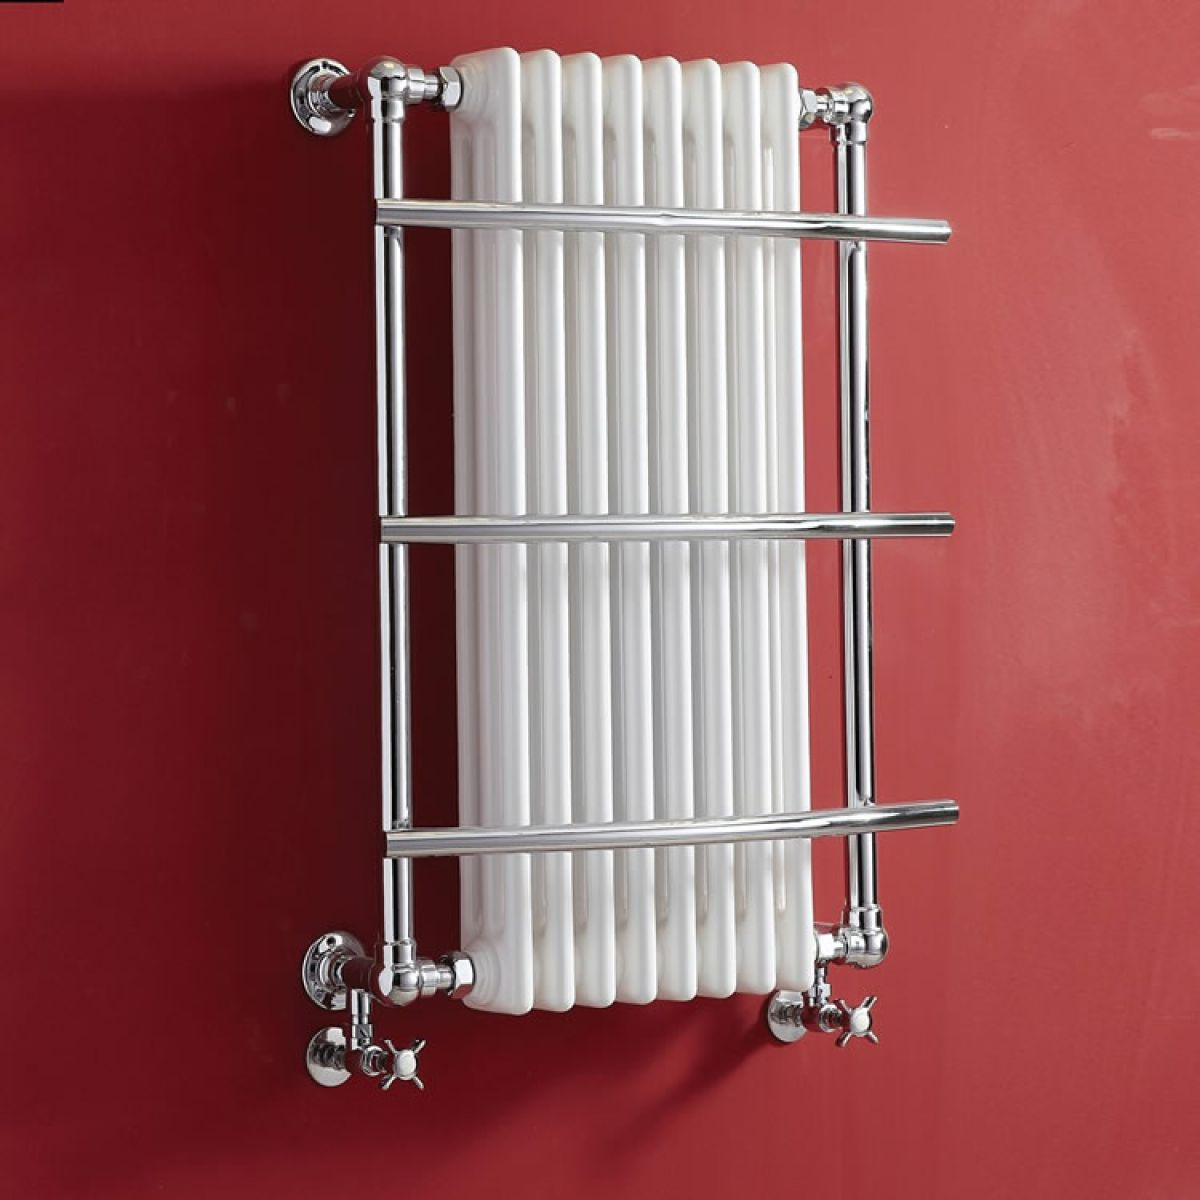 phoenix helena traditional towel rail uk bathrooms. Black Bedroom Furniture Sets. Home Design Ideas